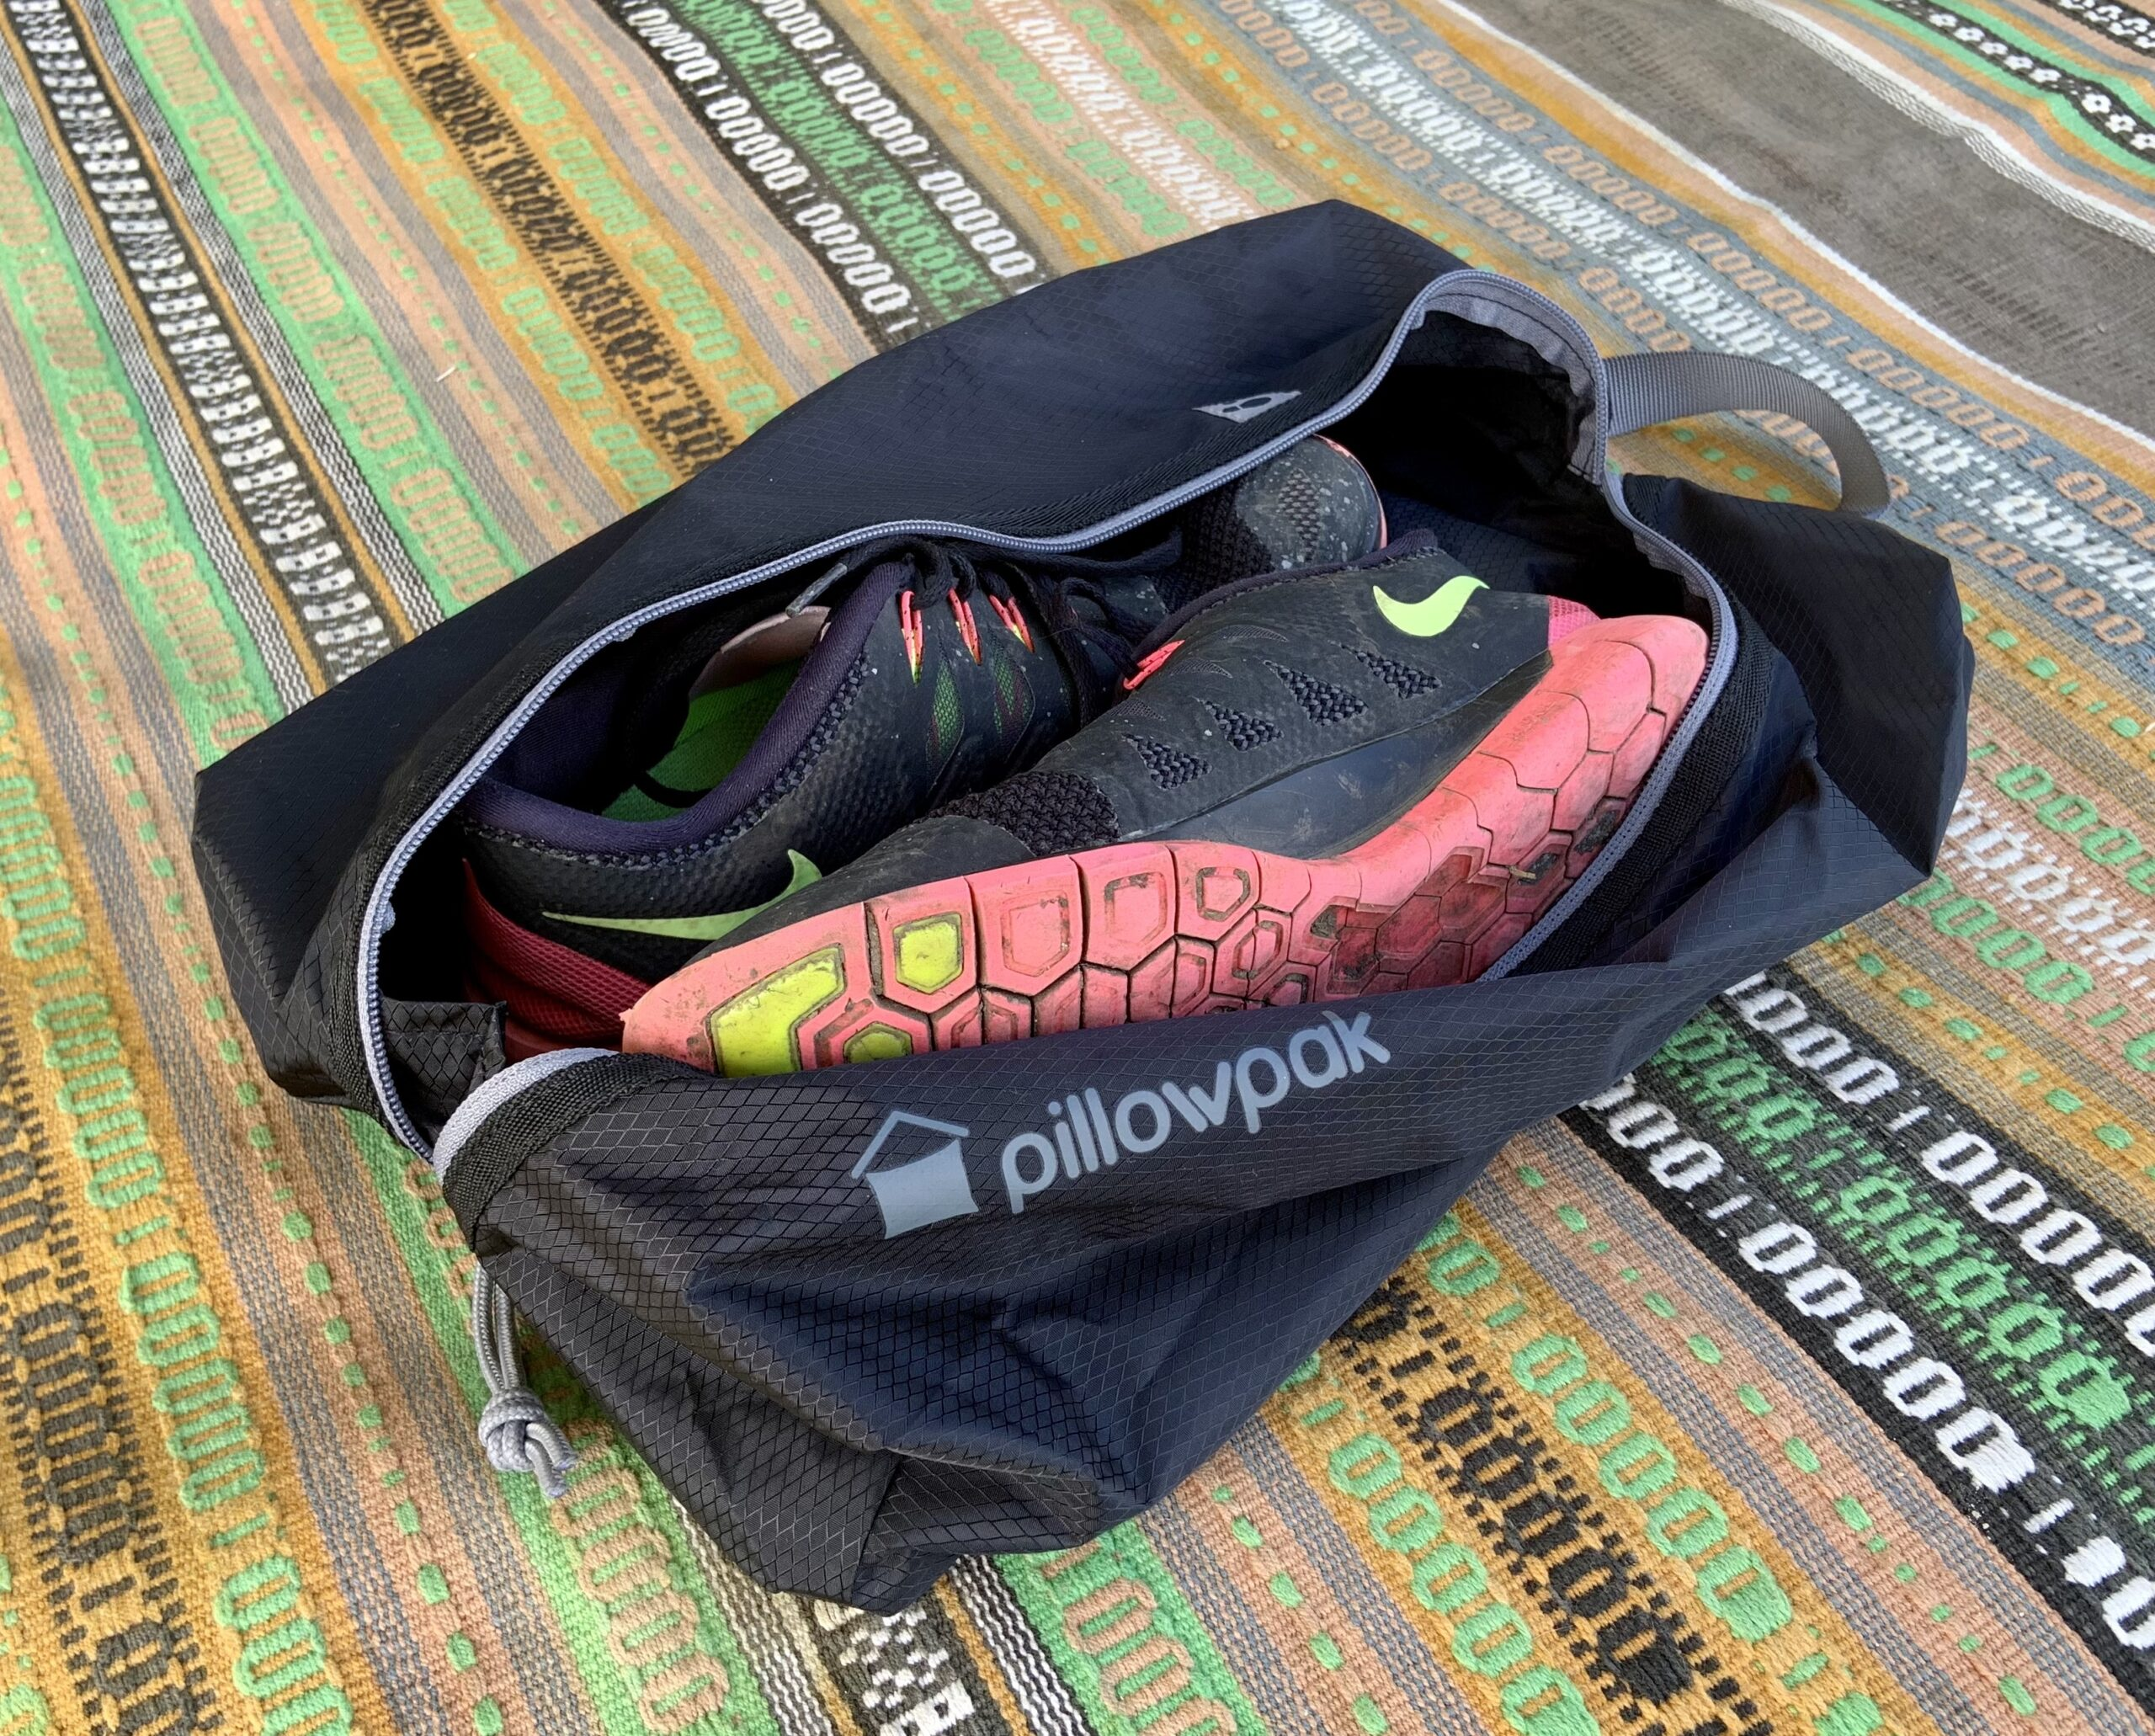 Pillowpak Shoe Bag Minimalist Storage